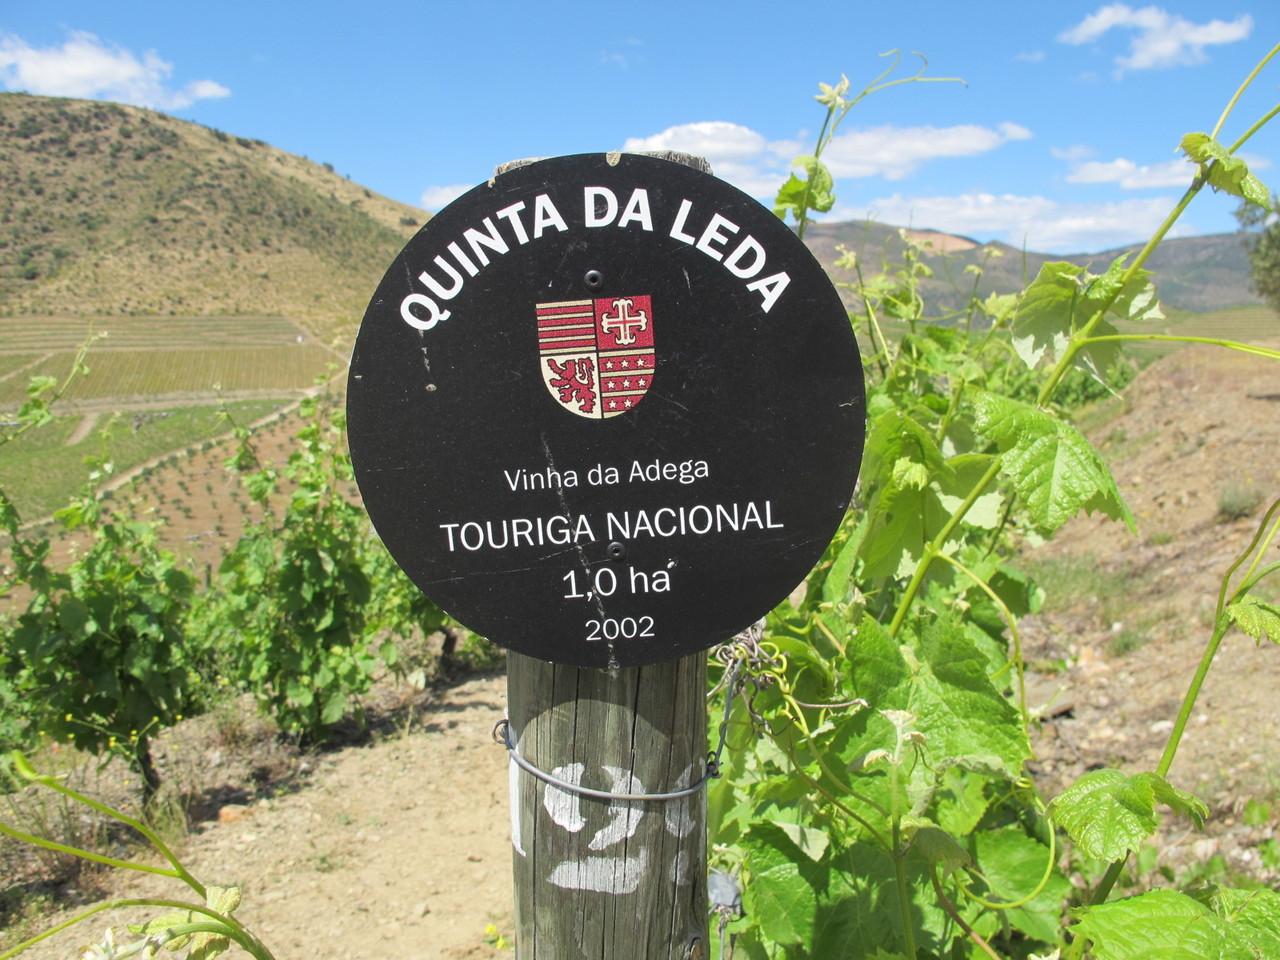 Quinta da Leda, Vinha da Adega